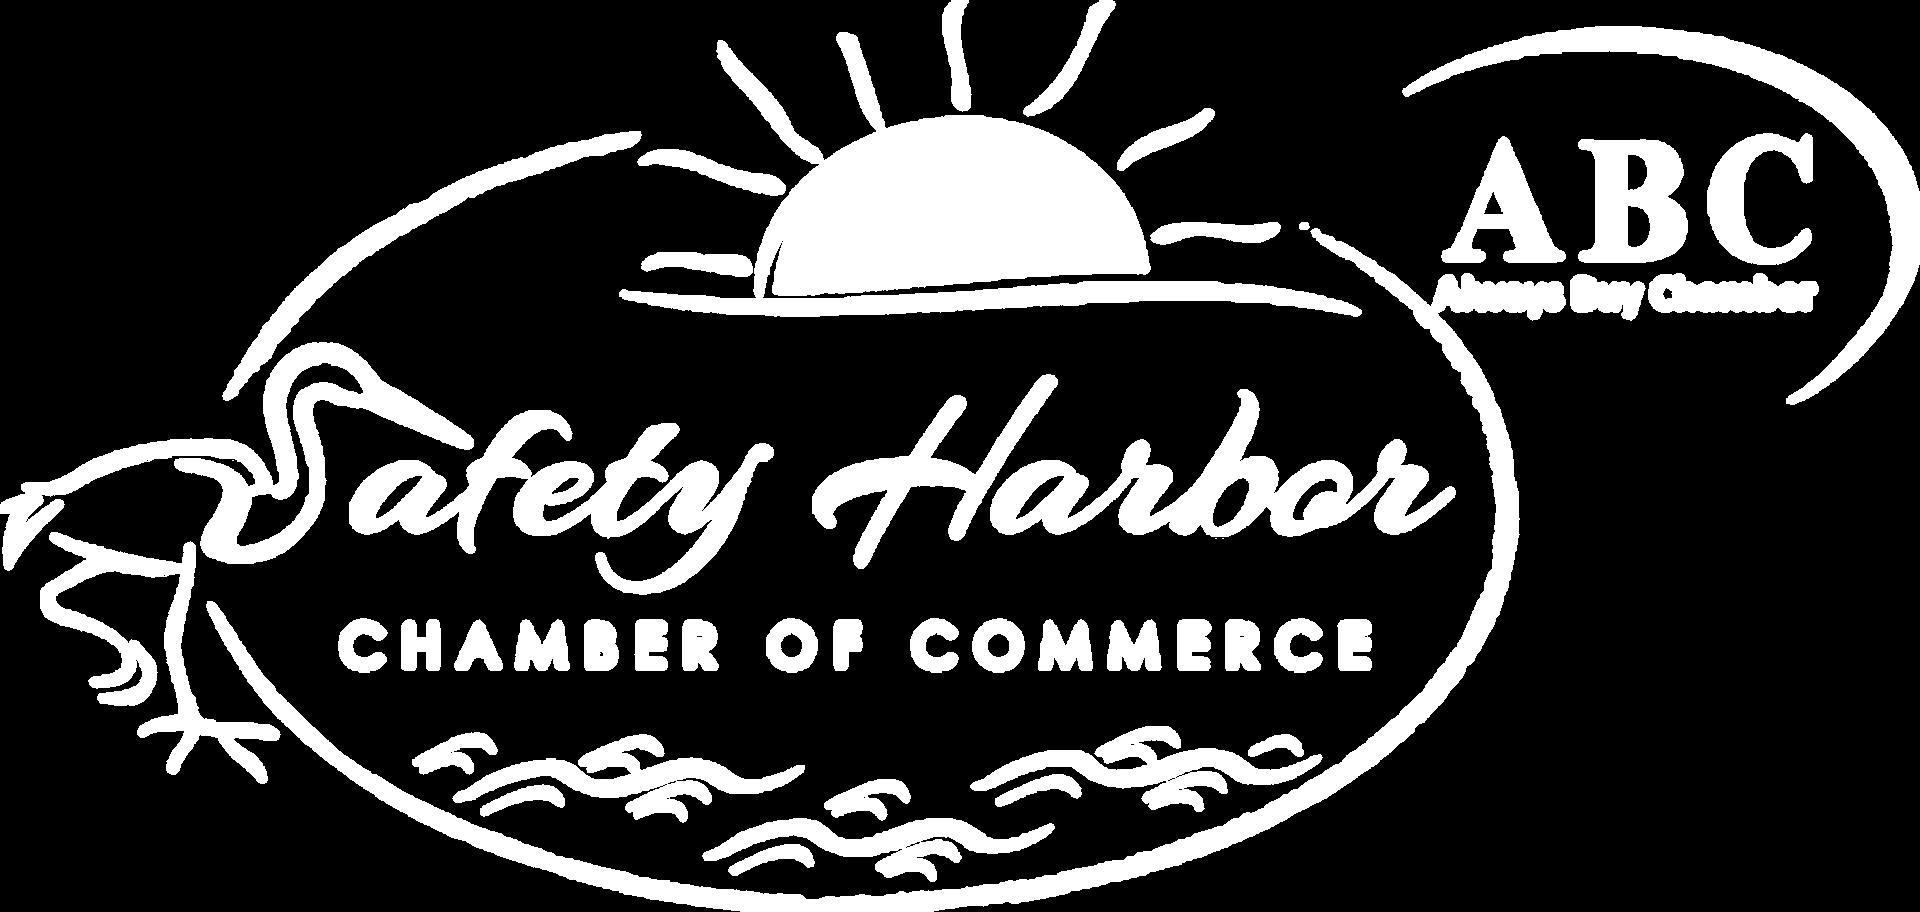 Safety Harbor Chamber of Commerce logo